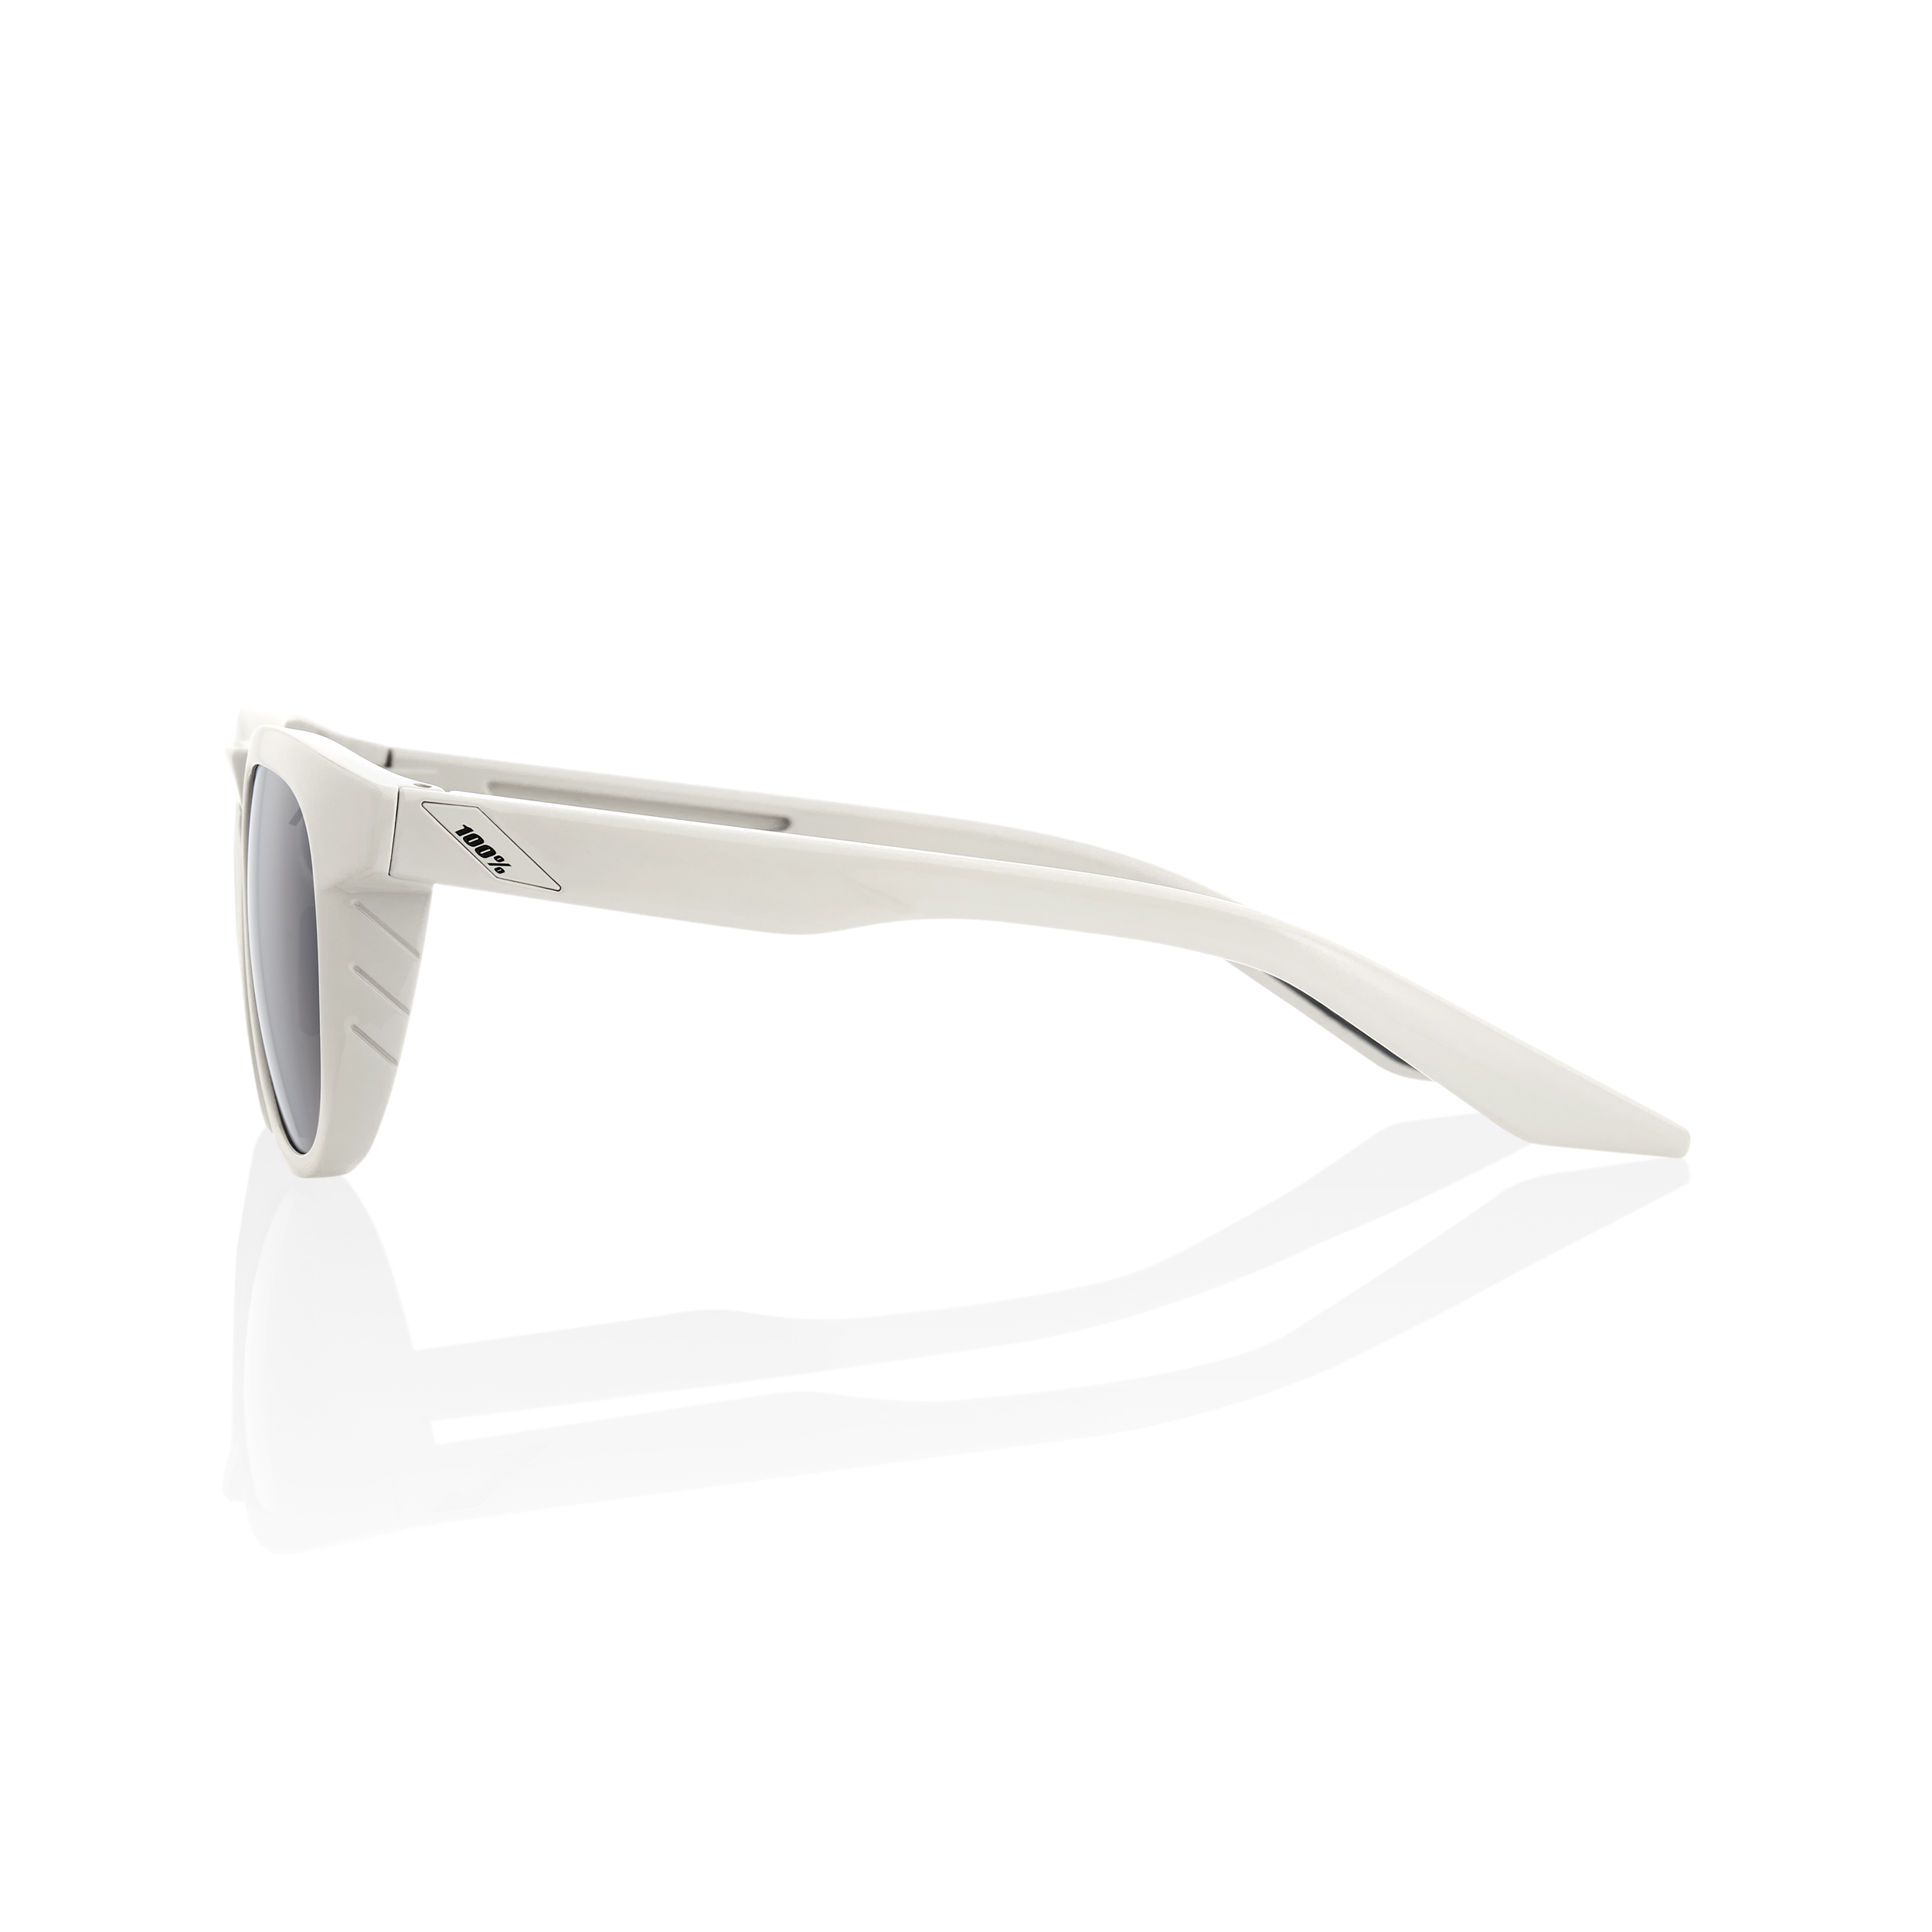 SLENT – Polished Haze – Smoke Lens